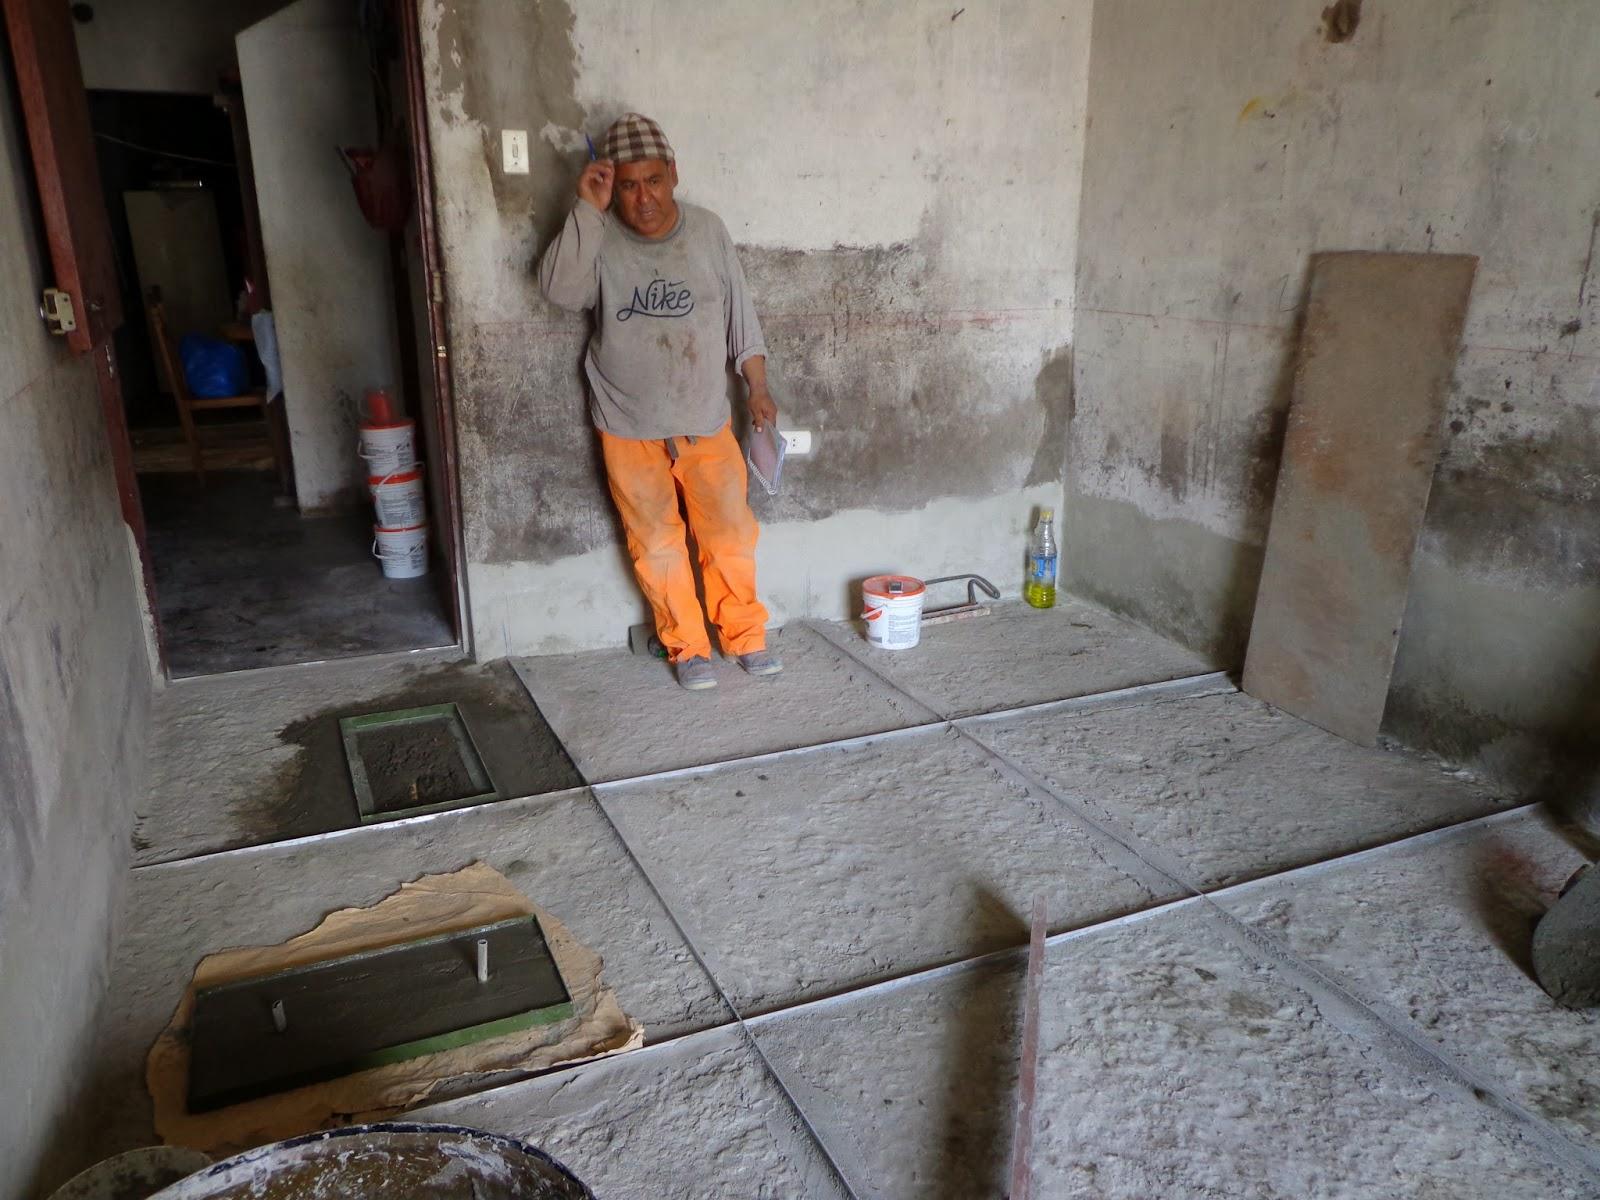 Maestro terrazero marmol reconstituido granito lavado lima for Marmol material de construccion